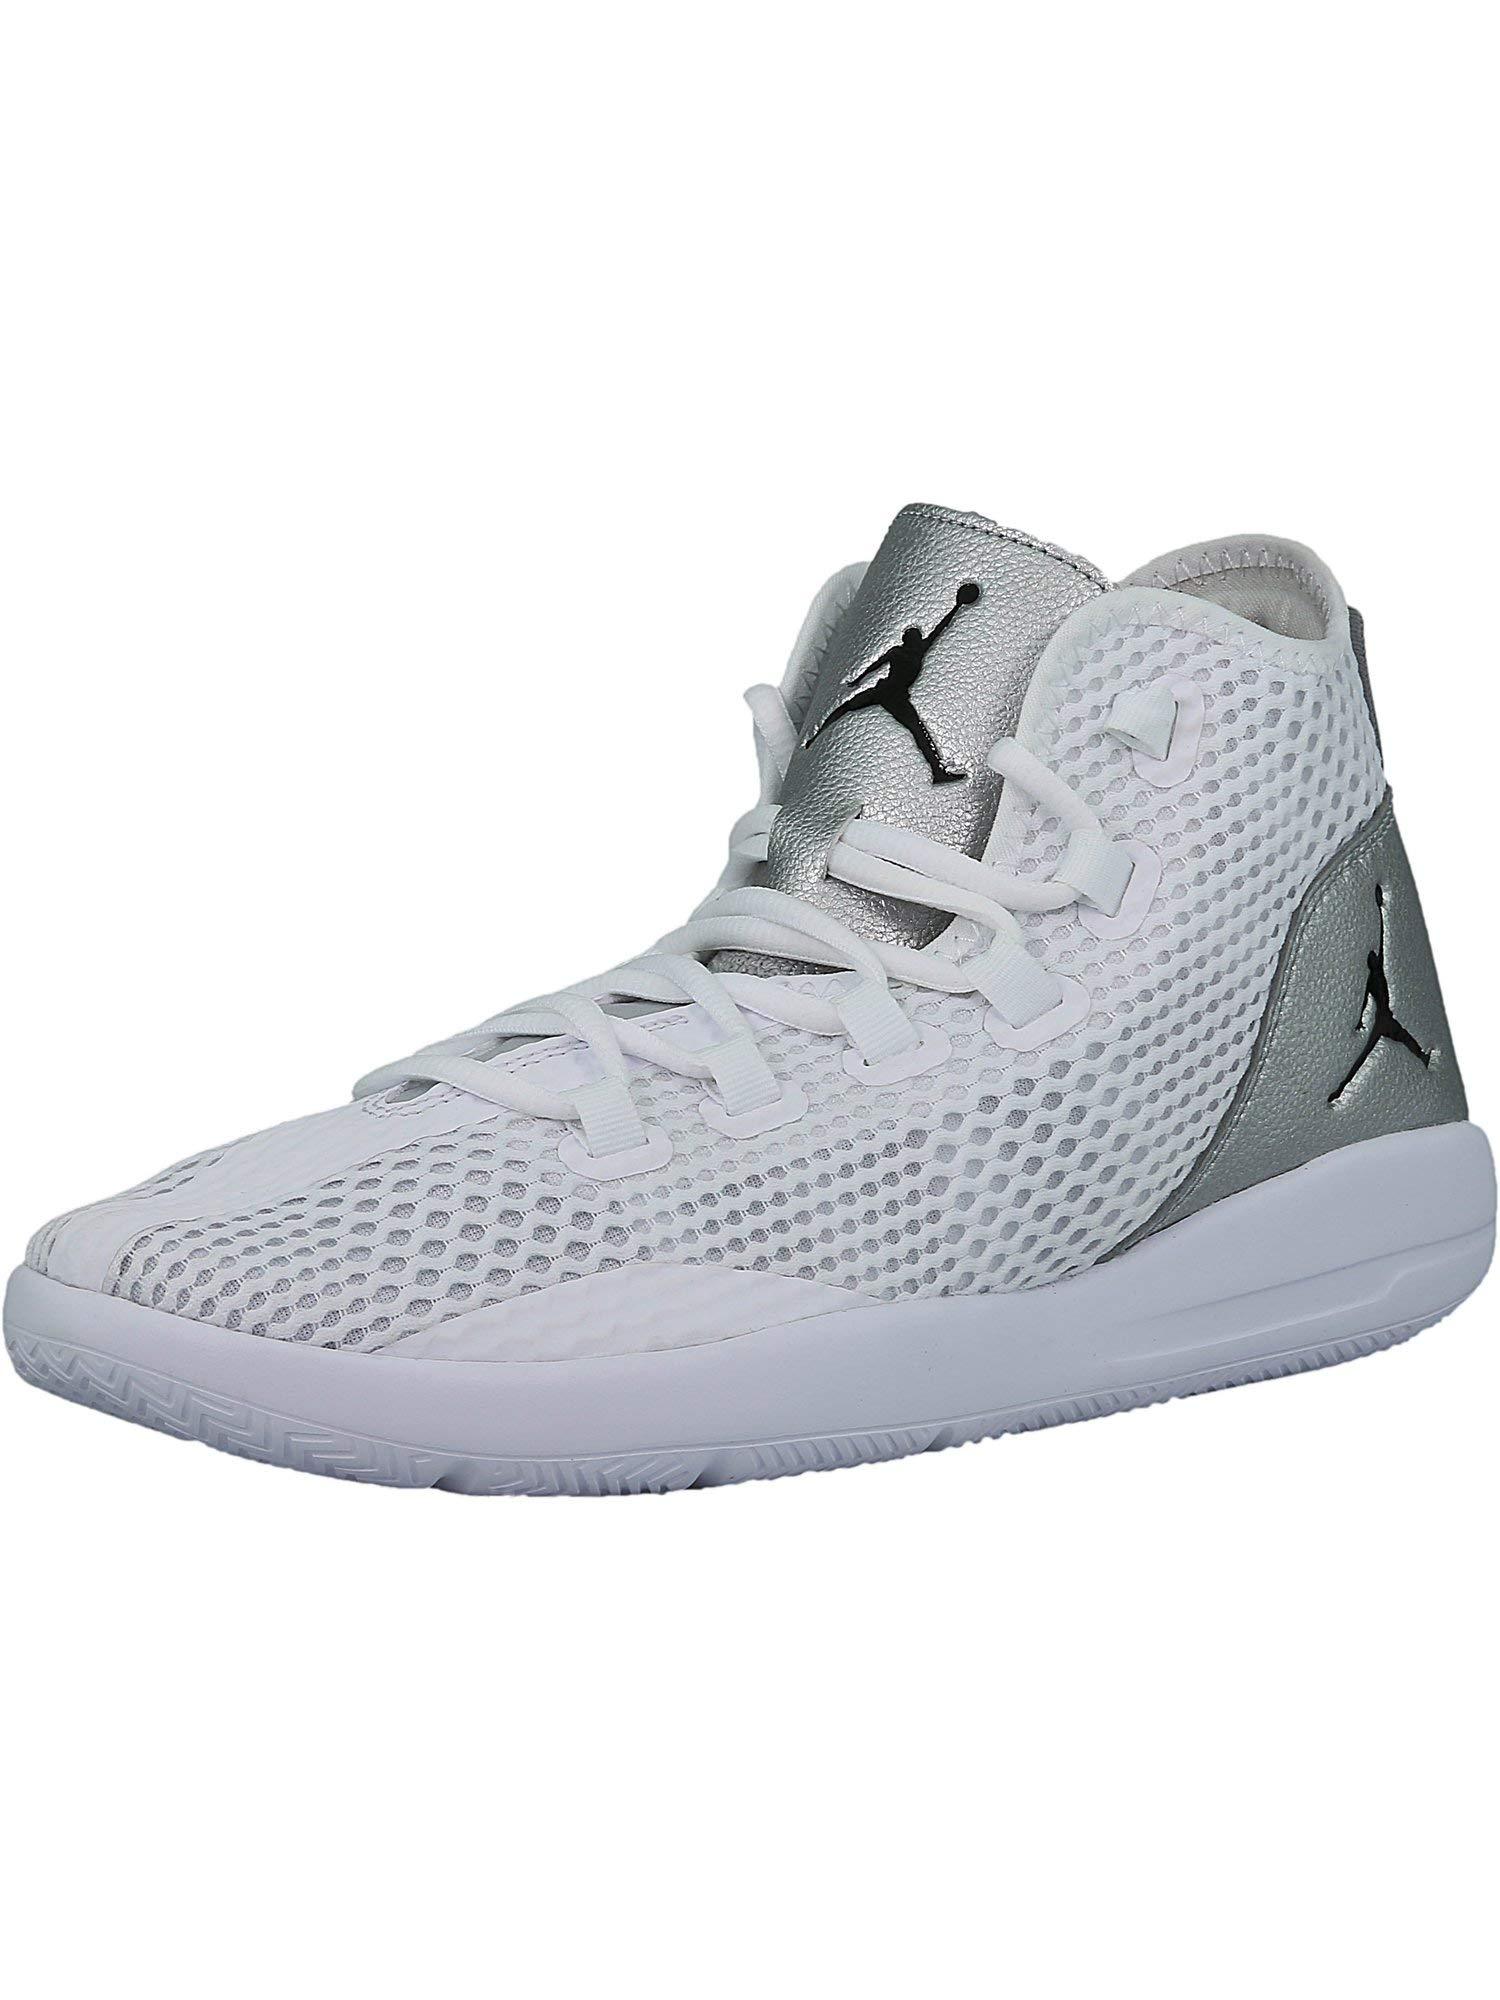 a8c5bc2c7e3 Galleon - Nike Mens Jordan Reveal White Black-Silver Fabric Size 10